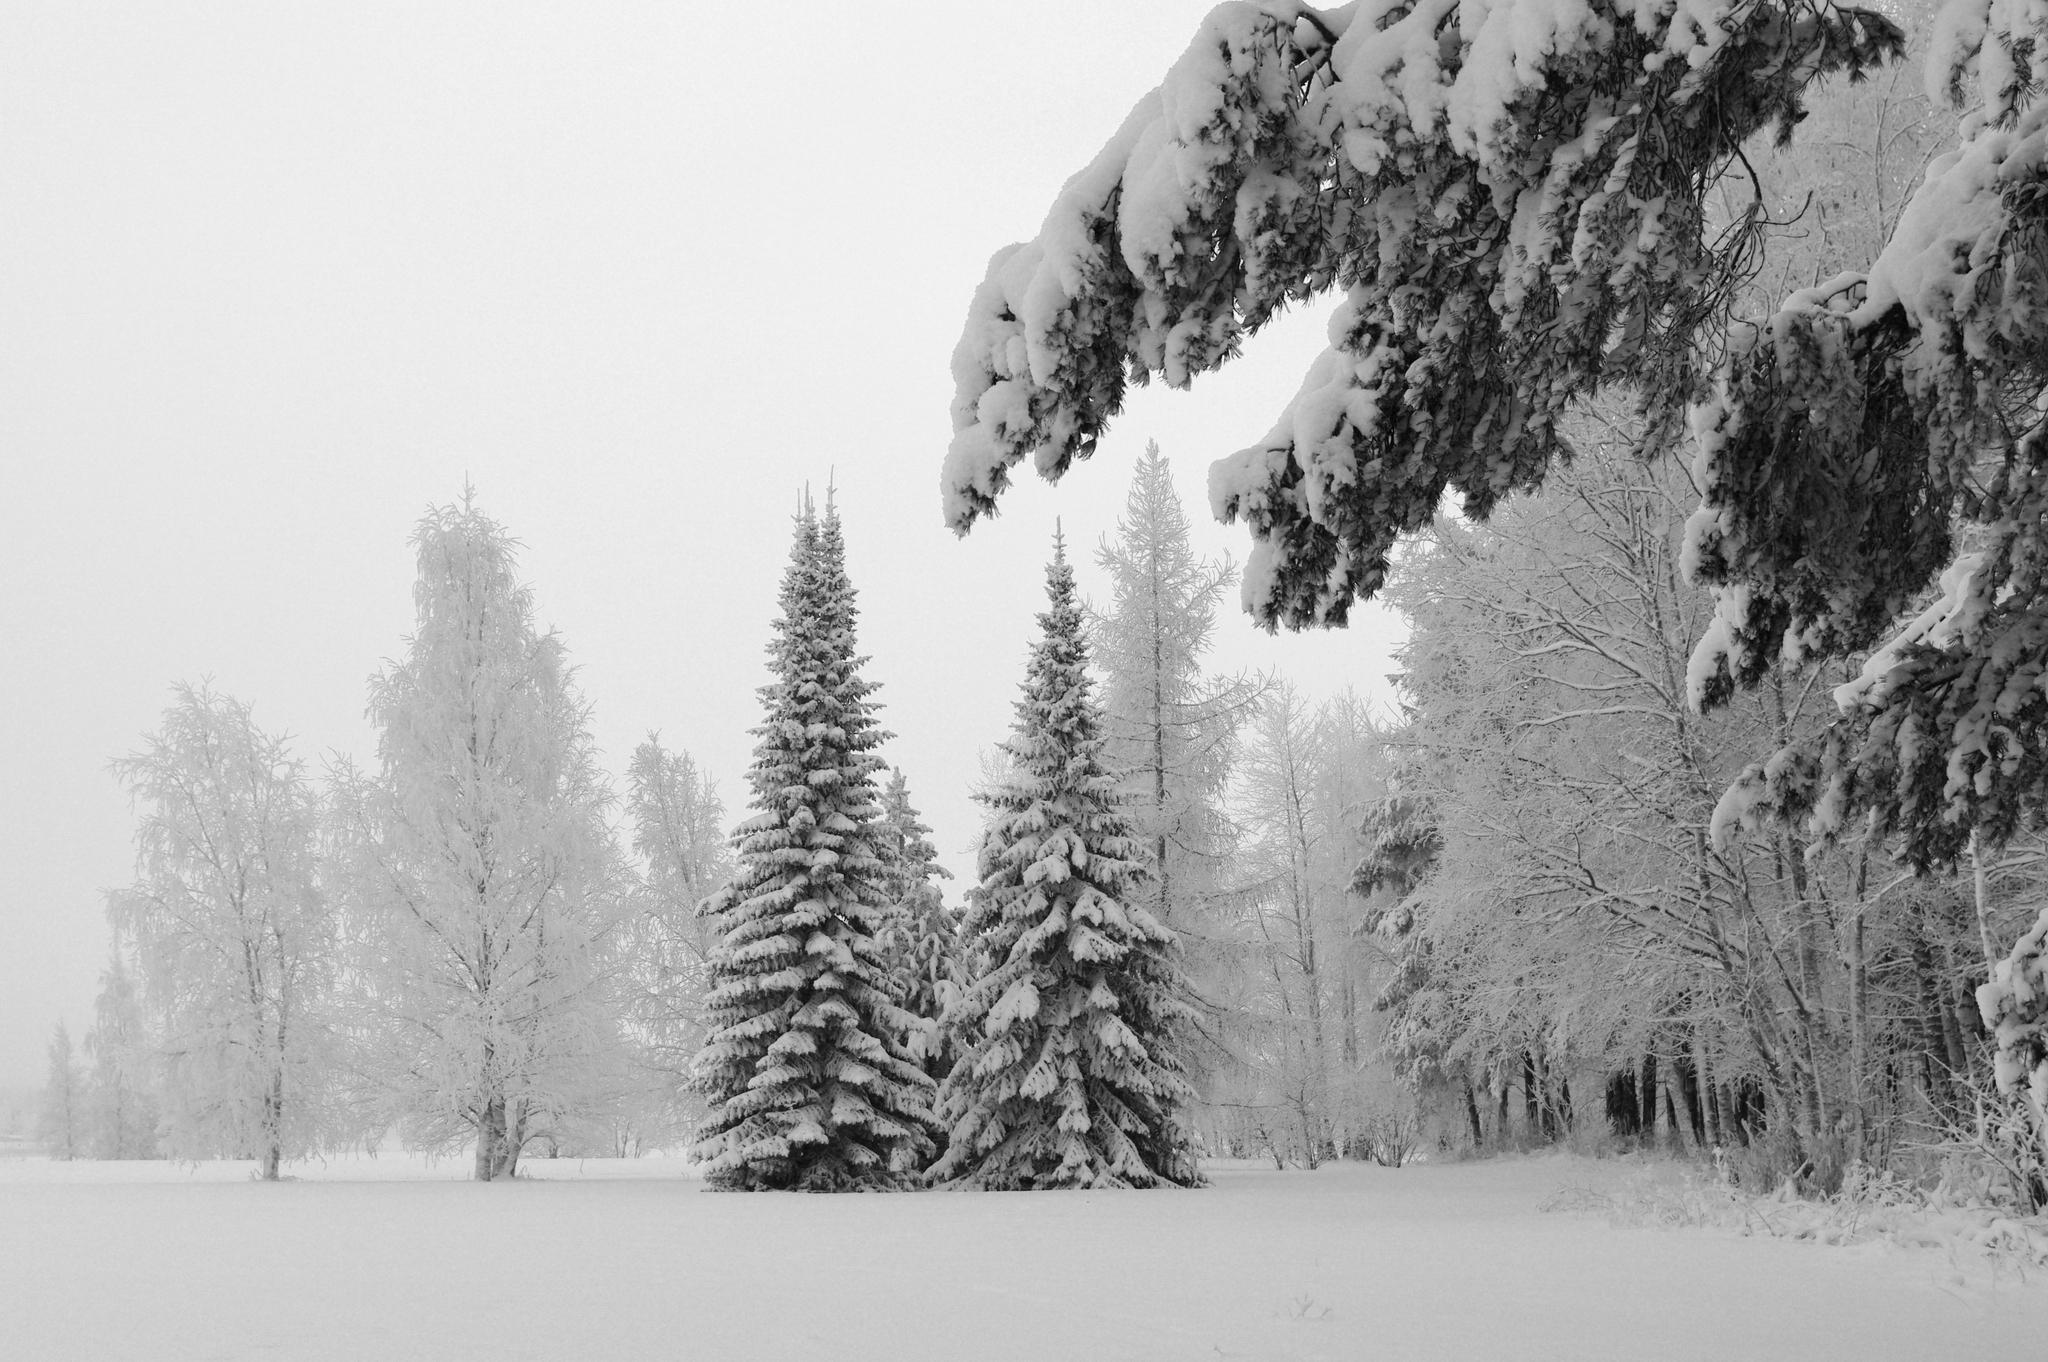 Зимний лес елки лиственница зима